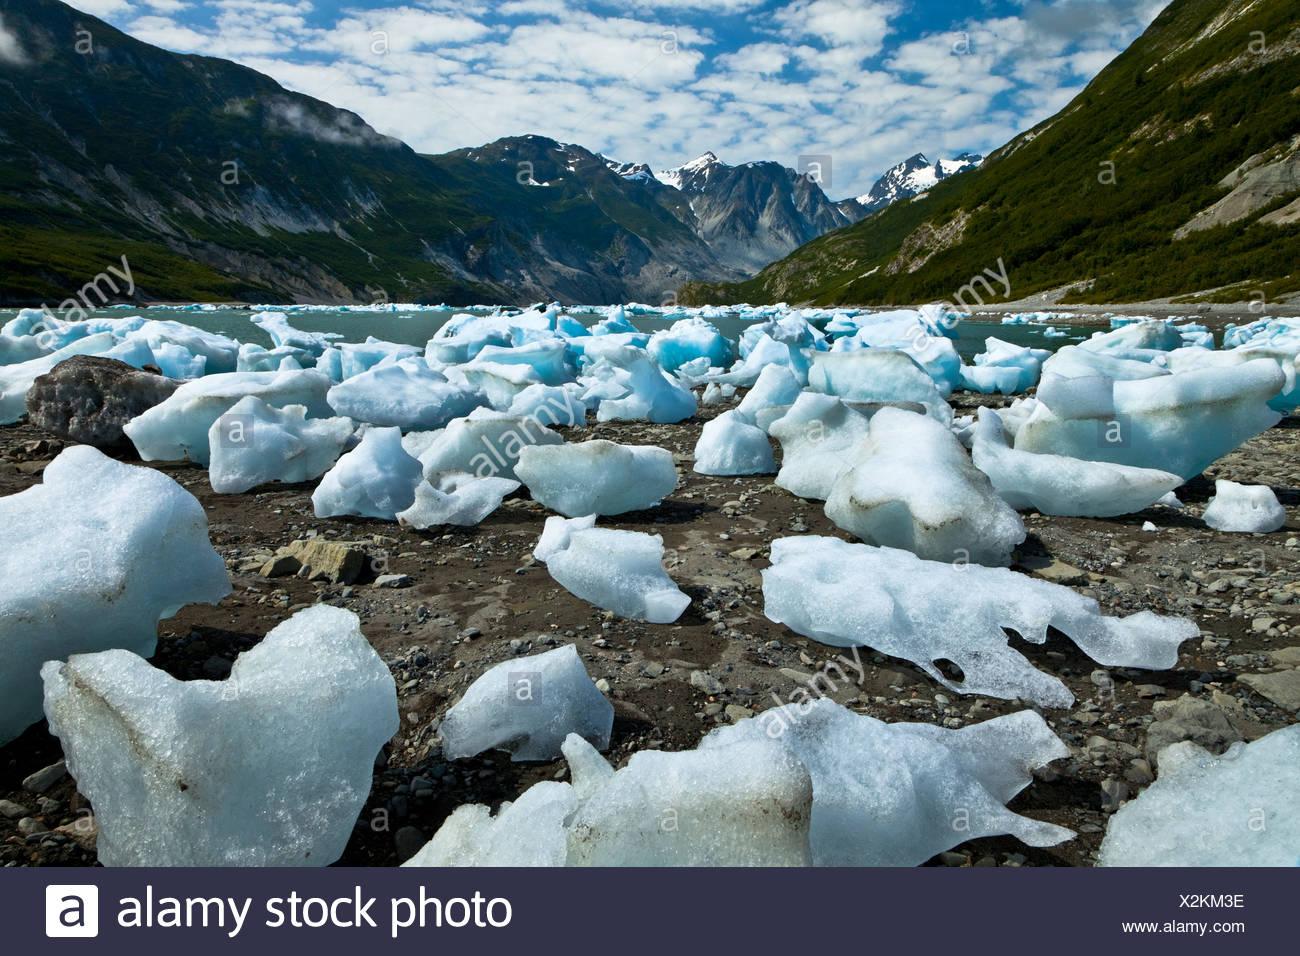 Scenic of icebergs from McBride Glacier in Muir Inlet, Glacier Bay National Park & Preserve, Southeast Alaska, Summer - Stock Image